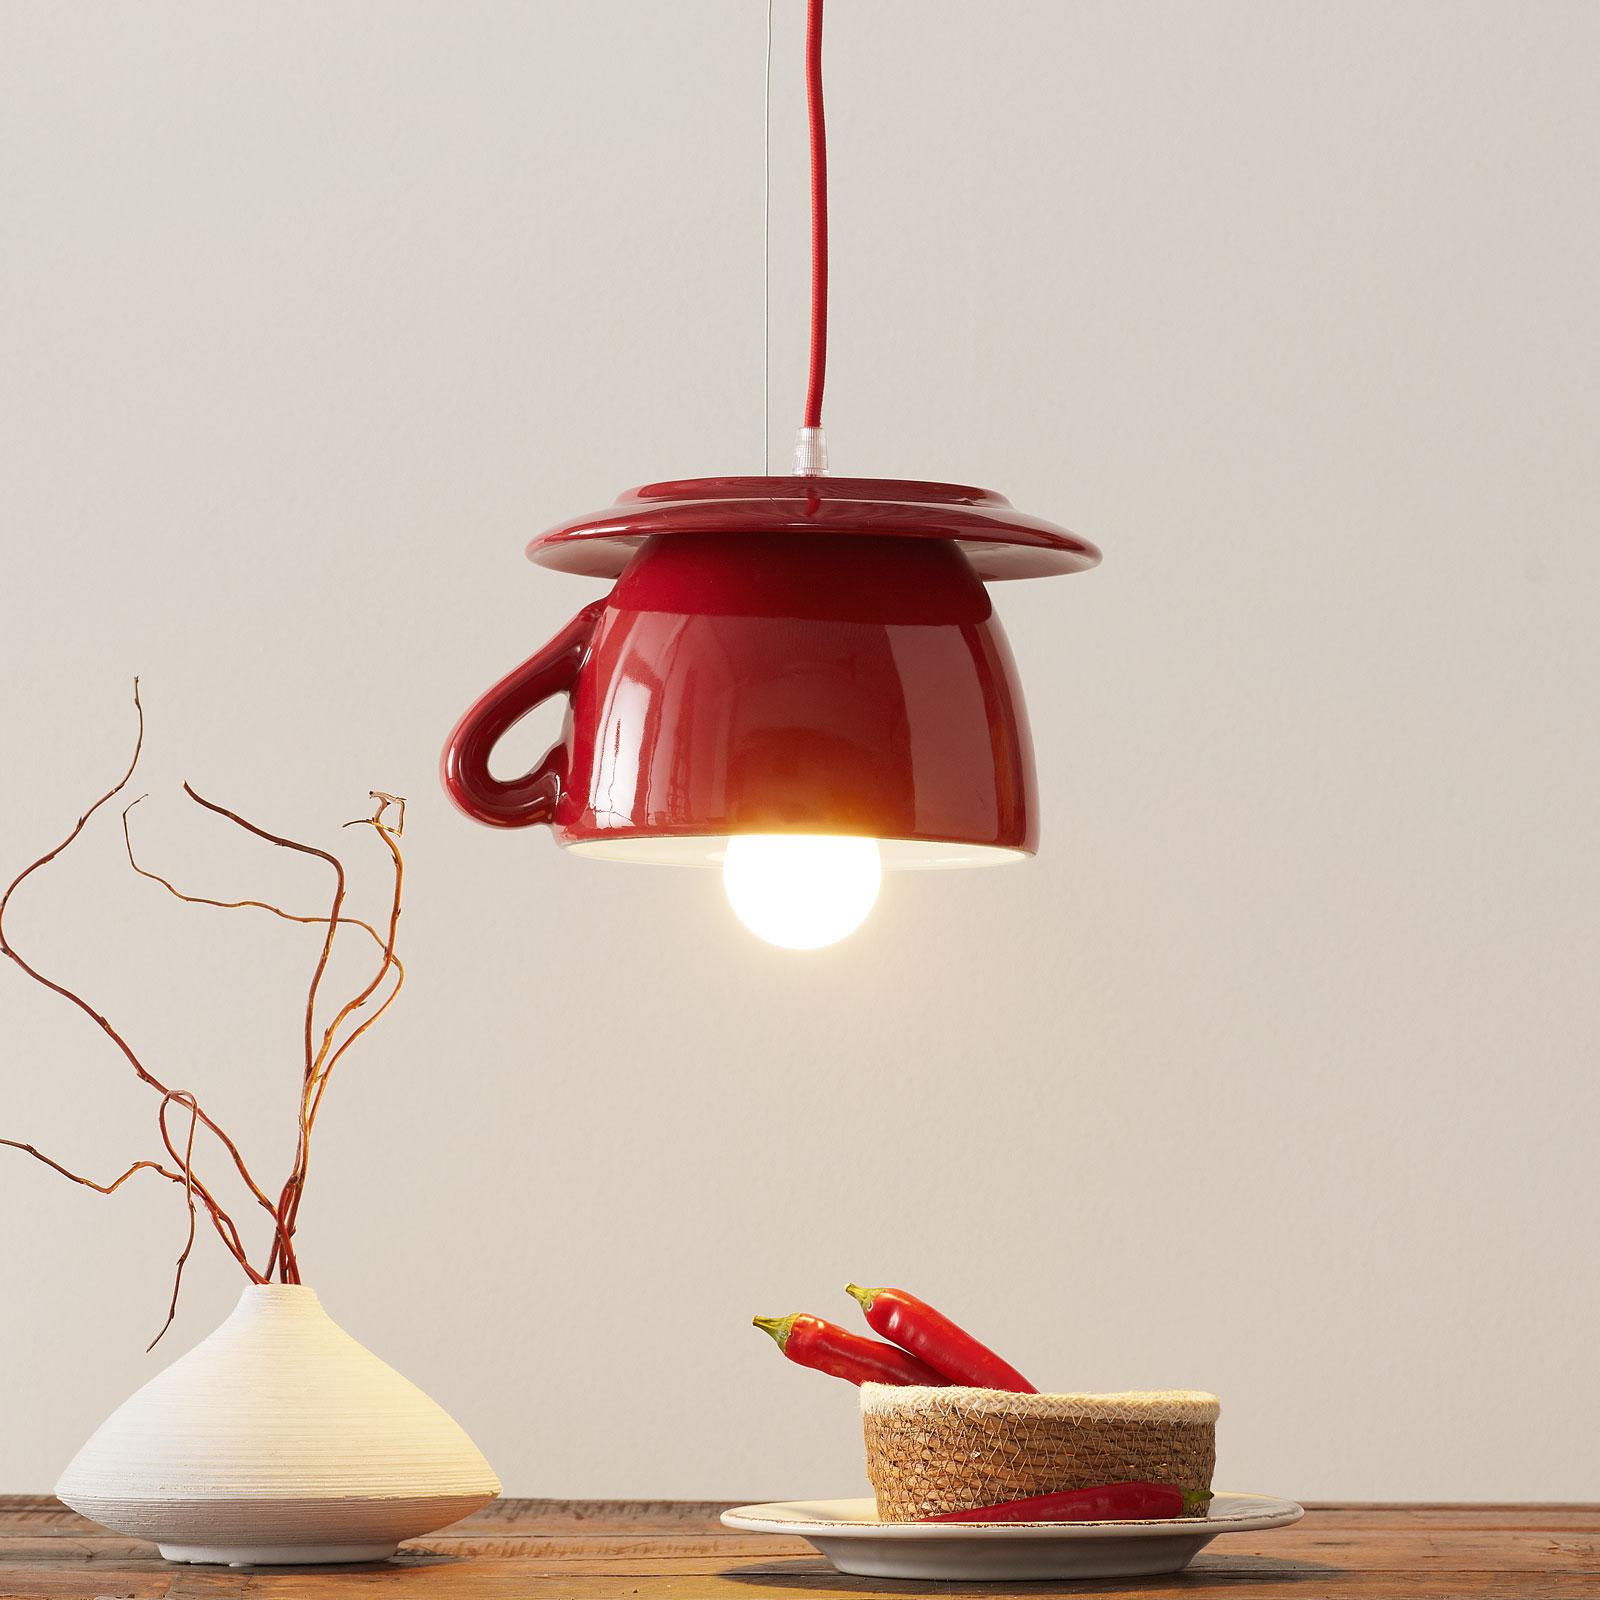 Keramiek-hanglamp S182, rood/hemelsblauw